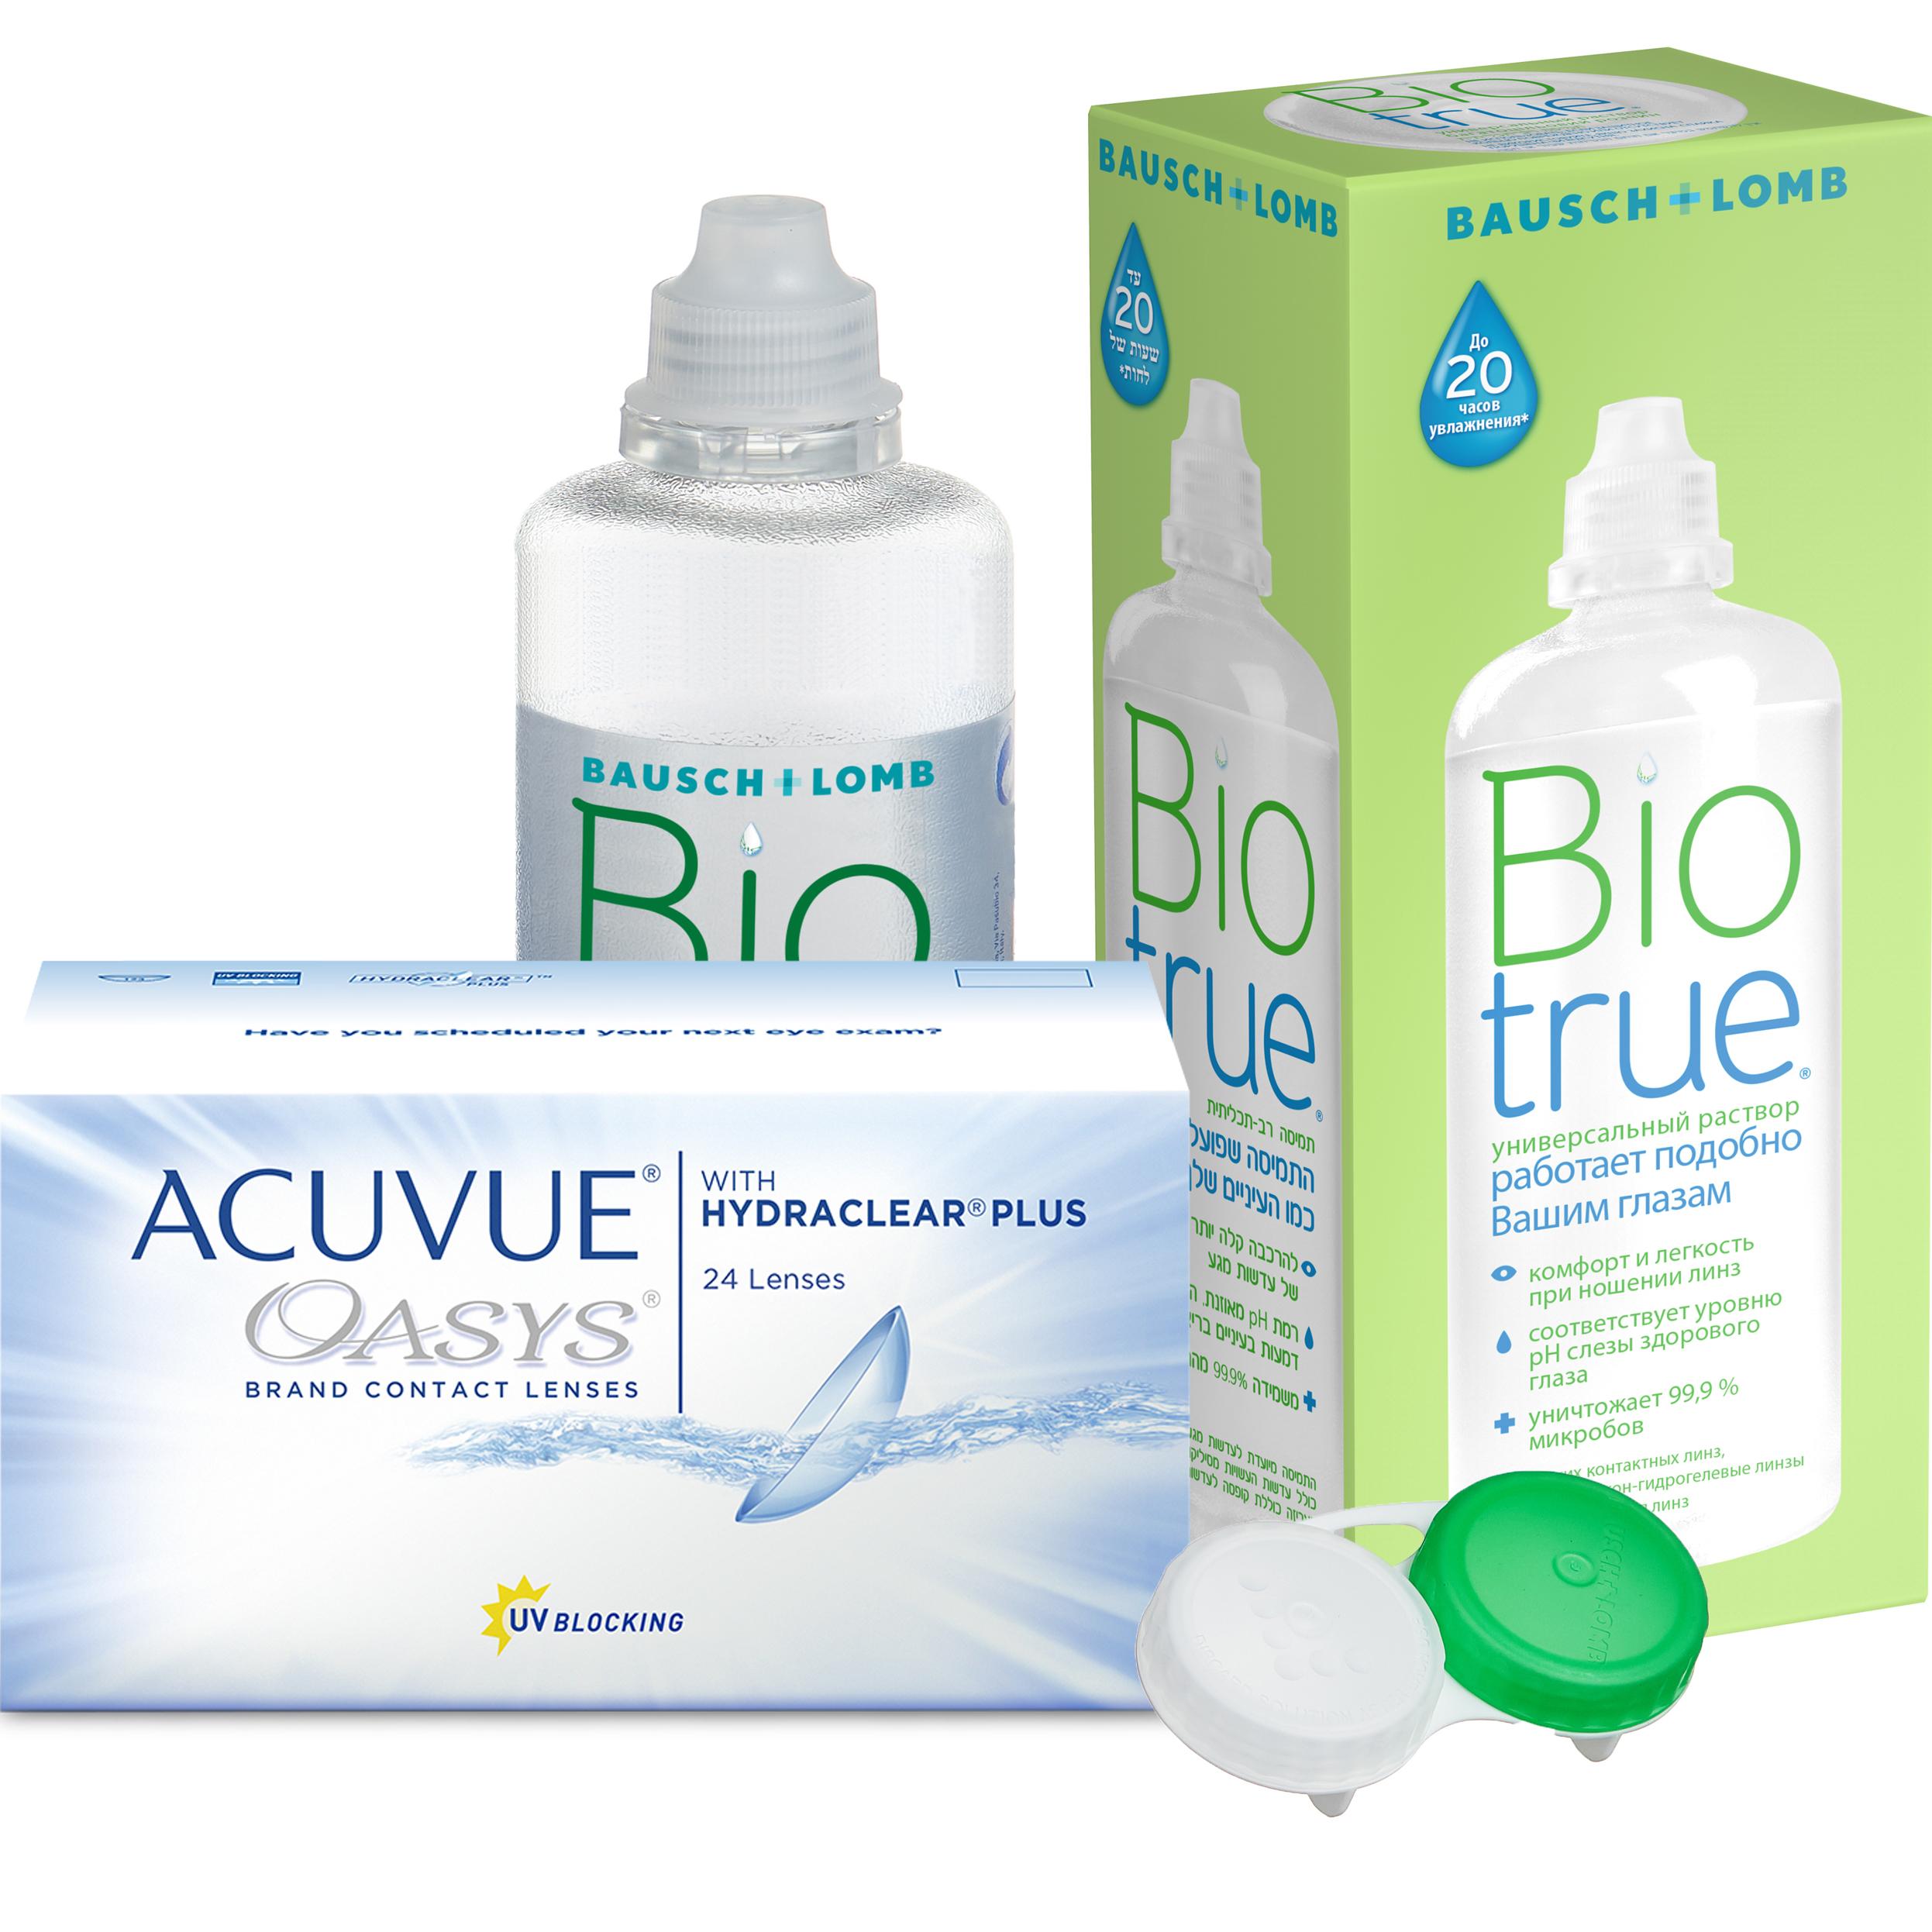 Купить Oasys with Hydraclear Plus 24 линзы + Biotrue, Контактные линзы Acuvue Oasys with Hydraclear Plus 24 линзы R 8.8 -4, 25 + Biotrue 300 мл